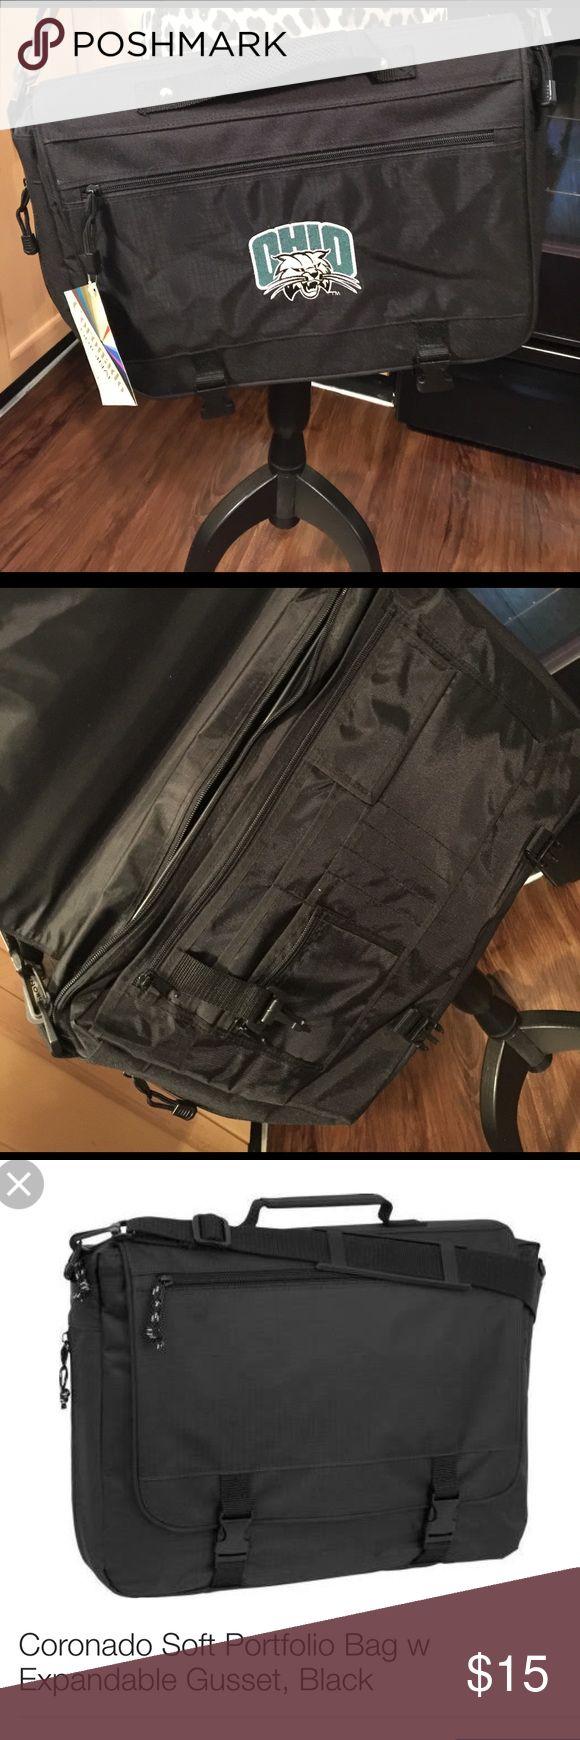 Ohio University Messenger Bag Brand new. Expandable. Bags Laptop Bags